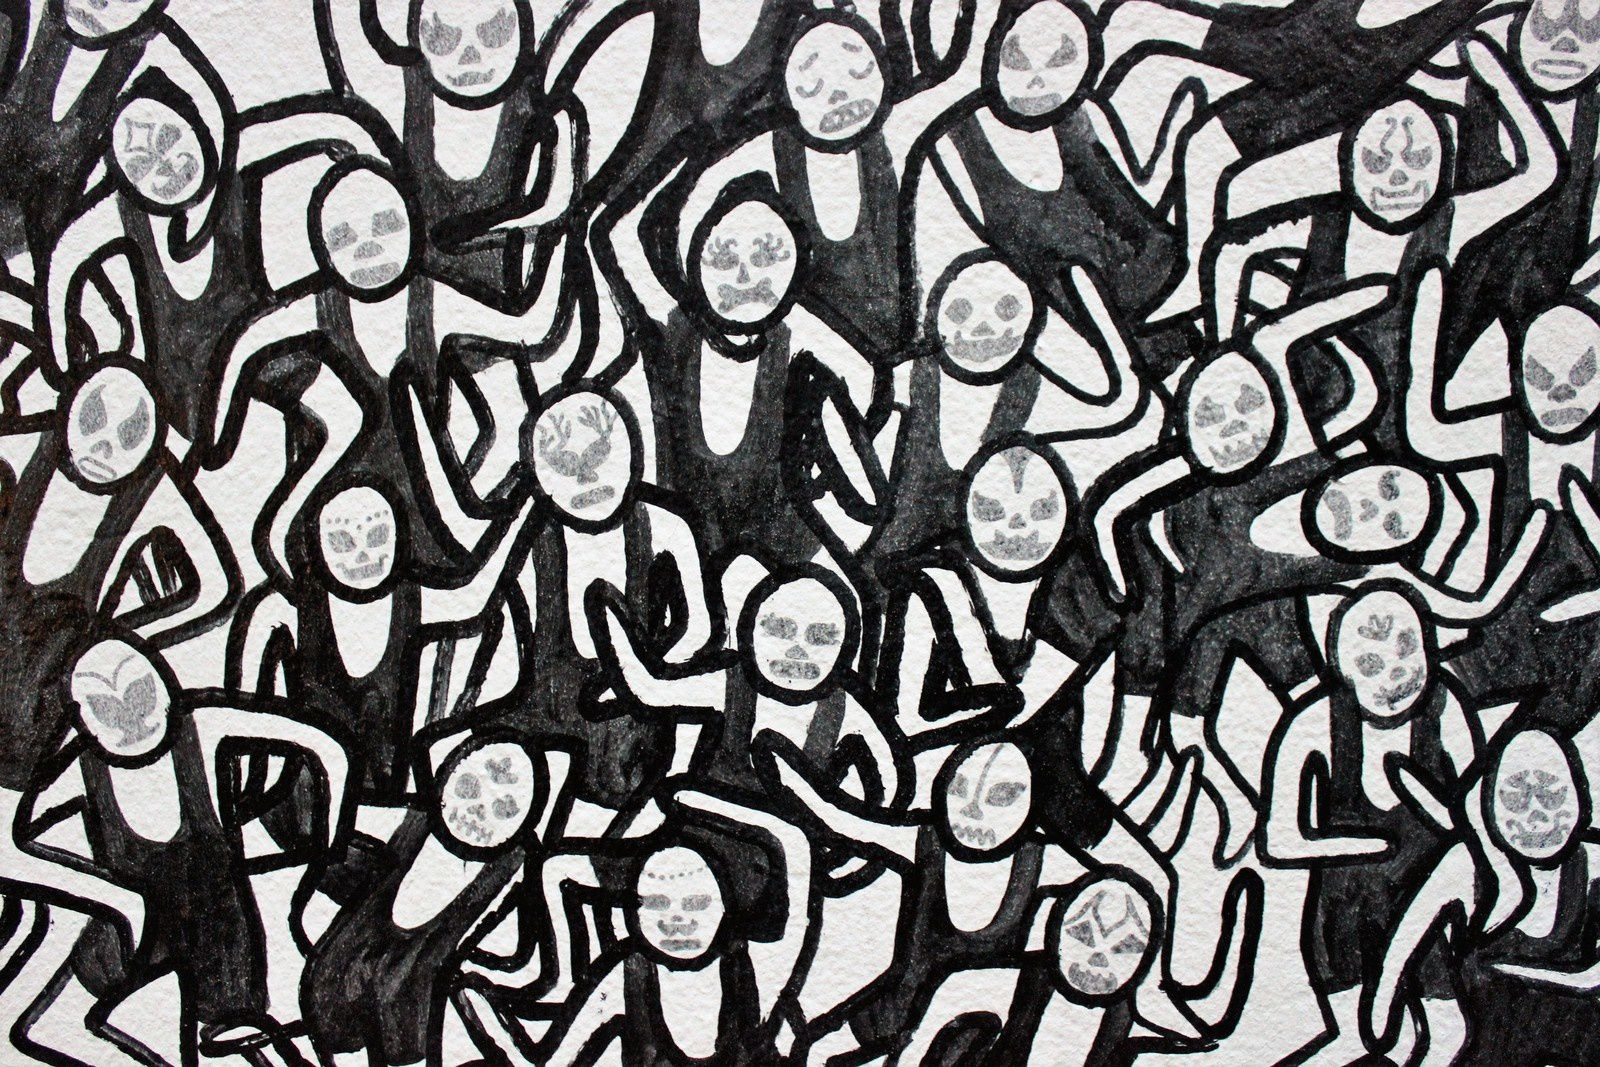 Street Art à Montmartre. (III)  Décembre-janvier 2016. Cub. Servoz. Iléa. Codex urbanus.